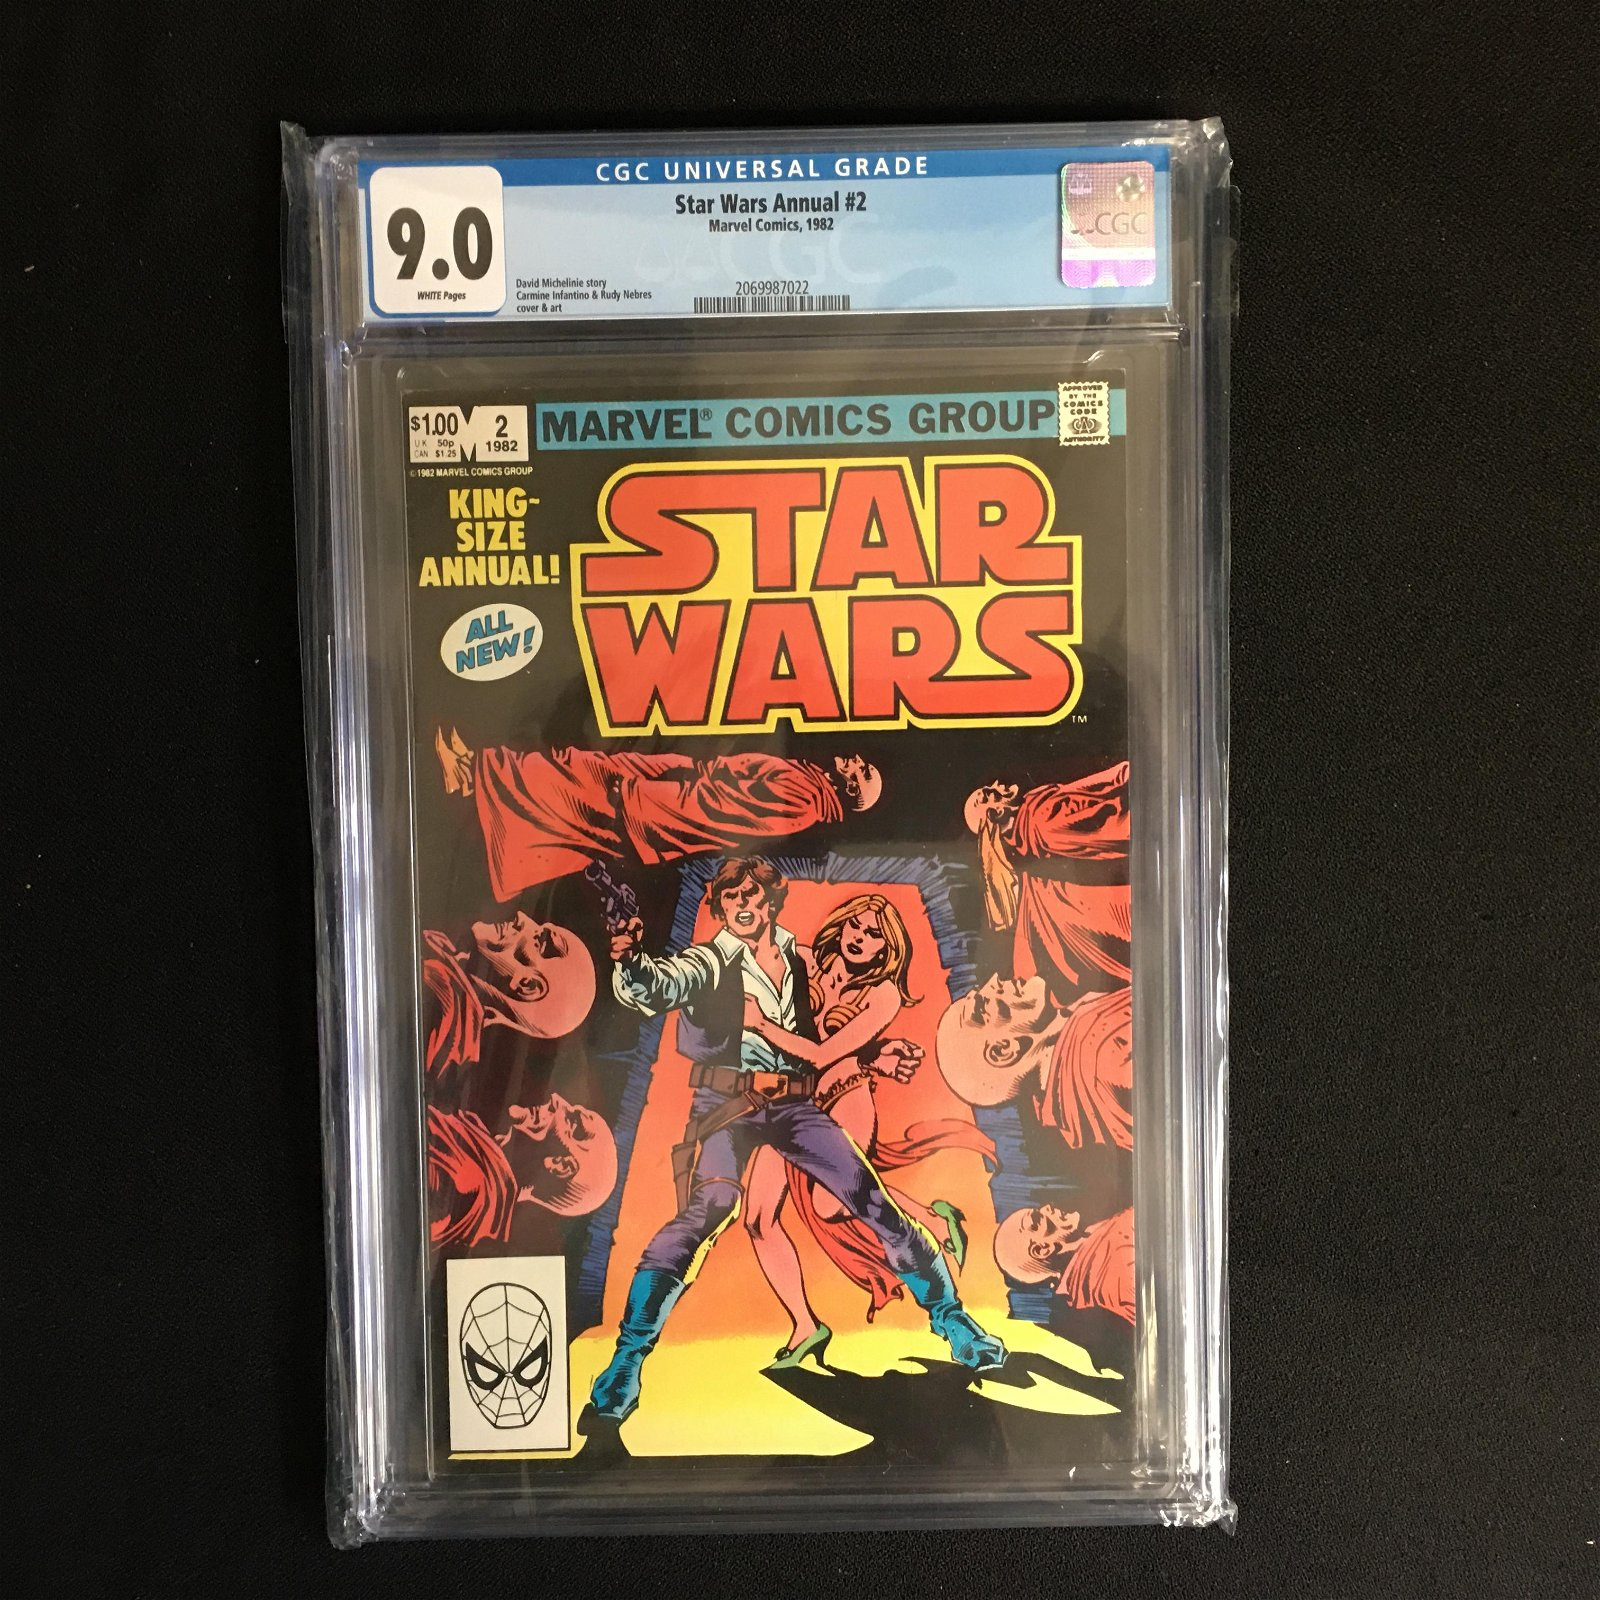 STAR WARS ANNUAL #2 (MARVEL COMICS) 1982 -CGC GRADED